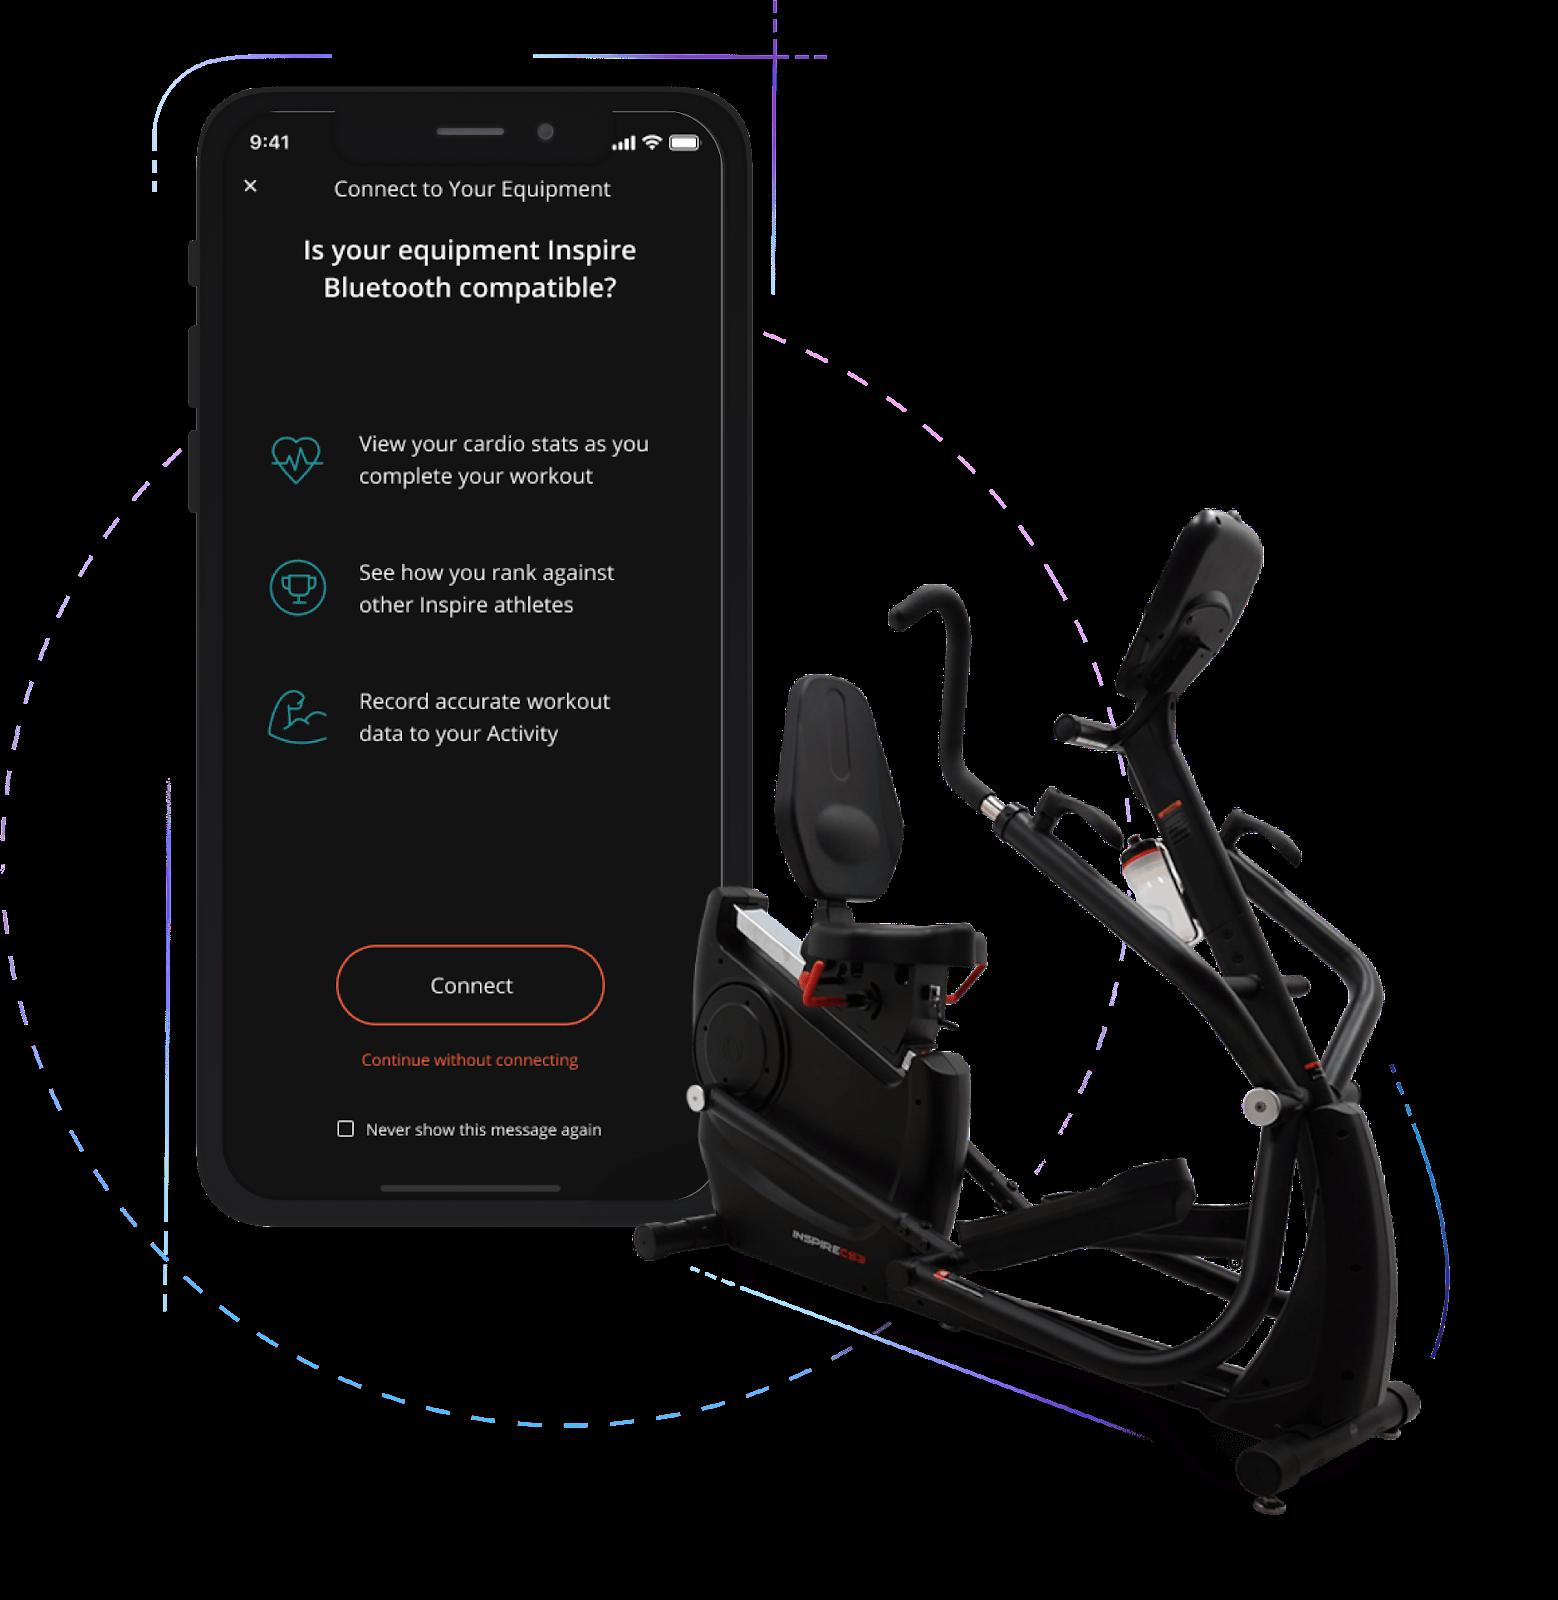 App screenshot next to exercise bike